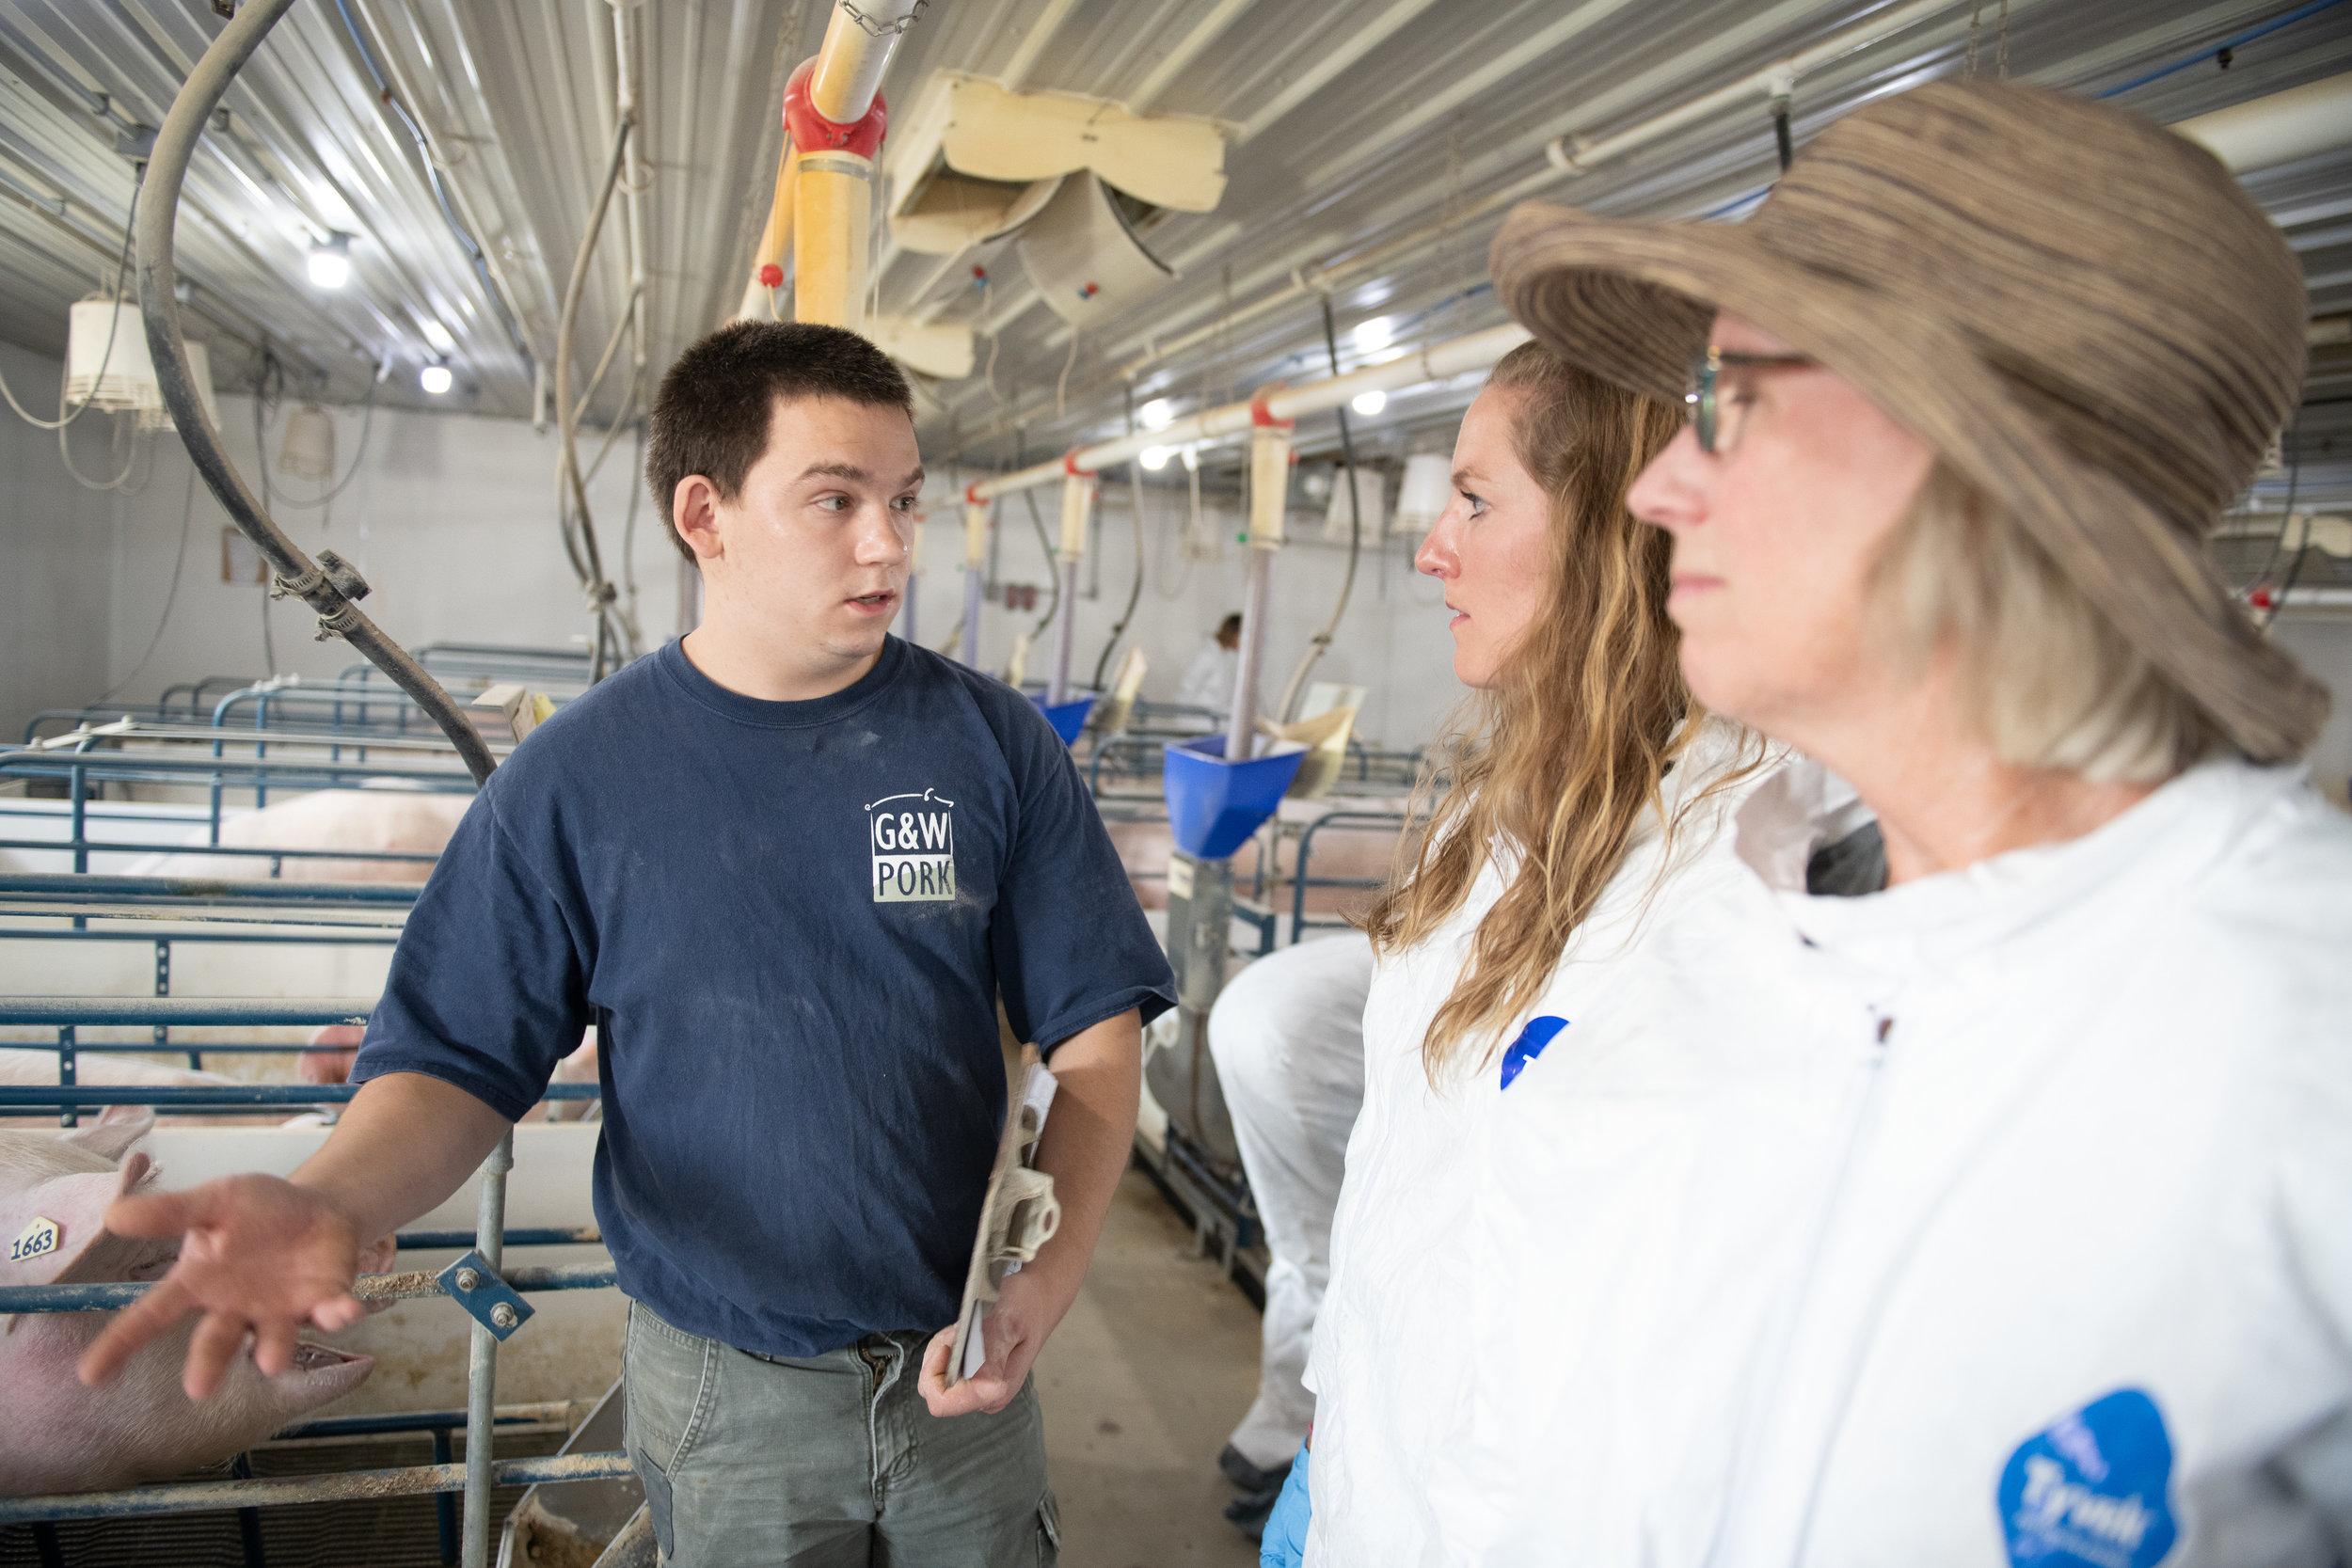 Participants tour a farrowing barn at G&W Pork in Aurora. Photo credit: Joseph L. Murphy/Iowa Soybean Association